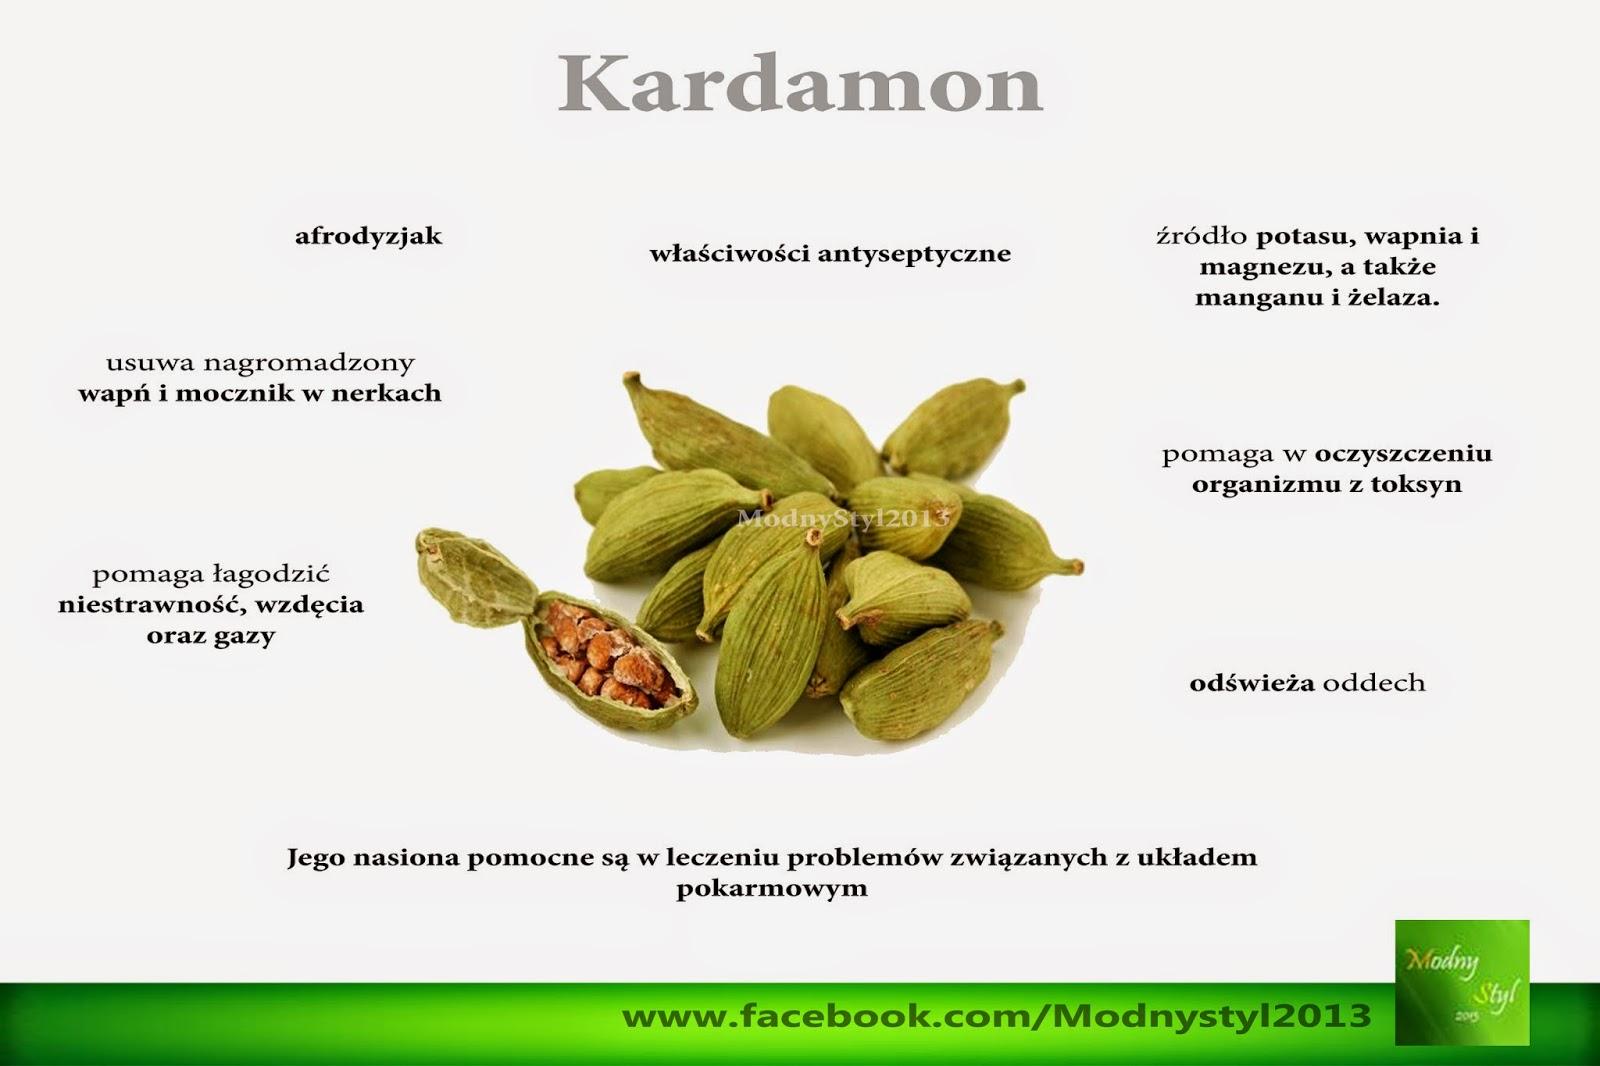 Kuchenne lekarstwo - kardamon